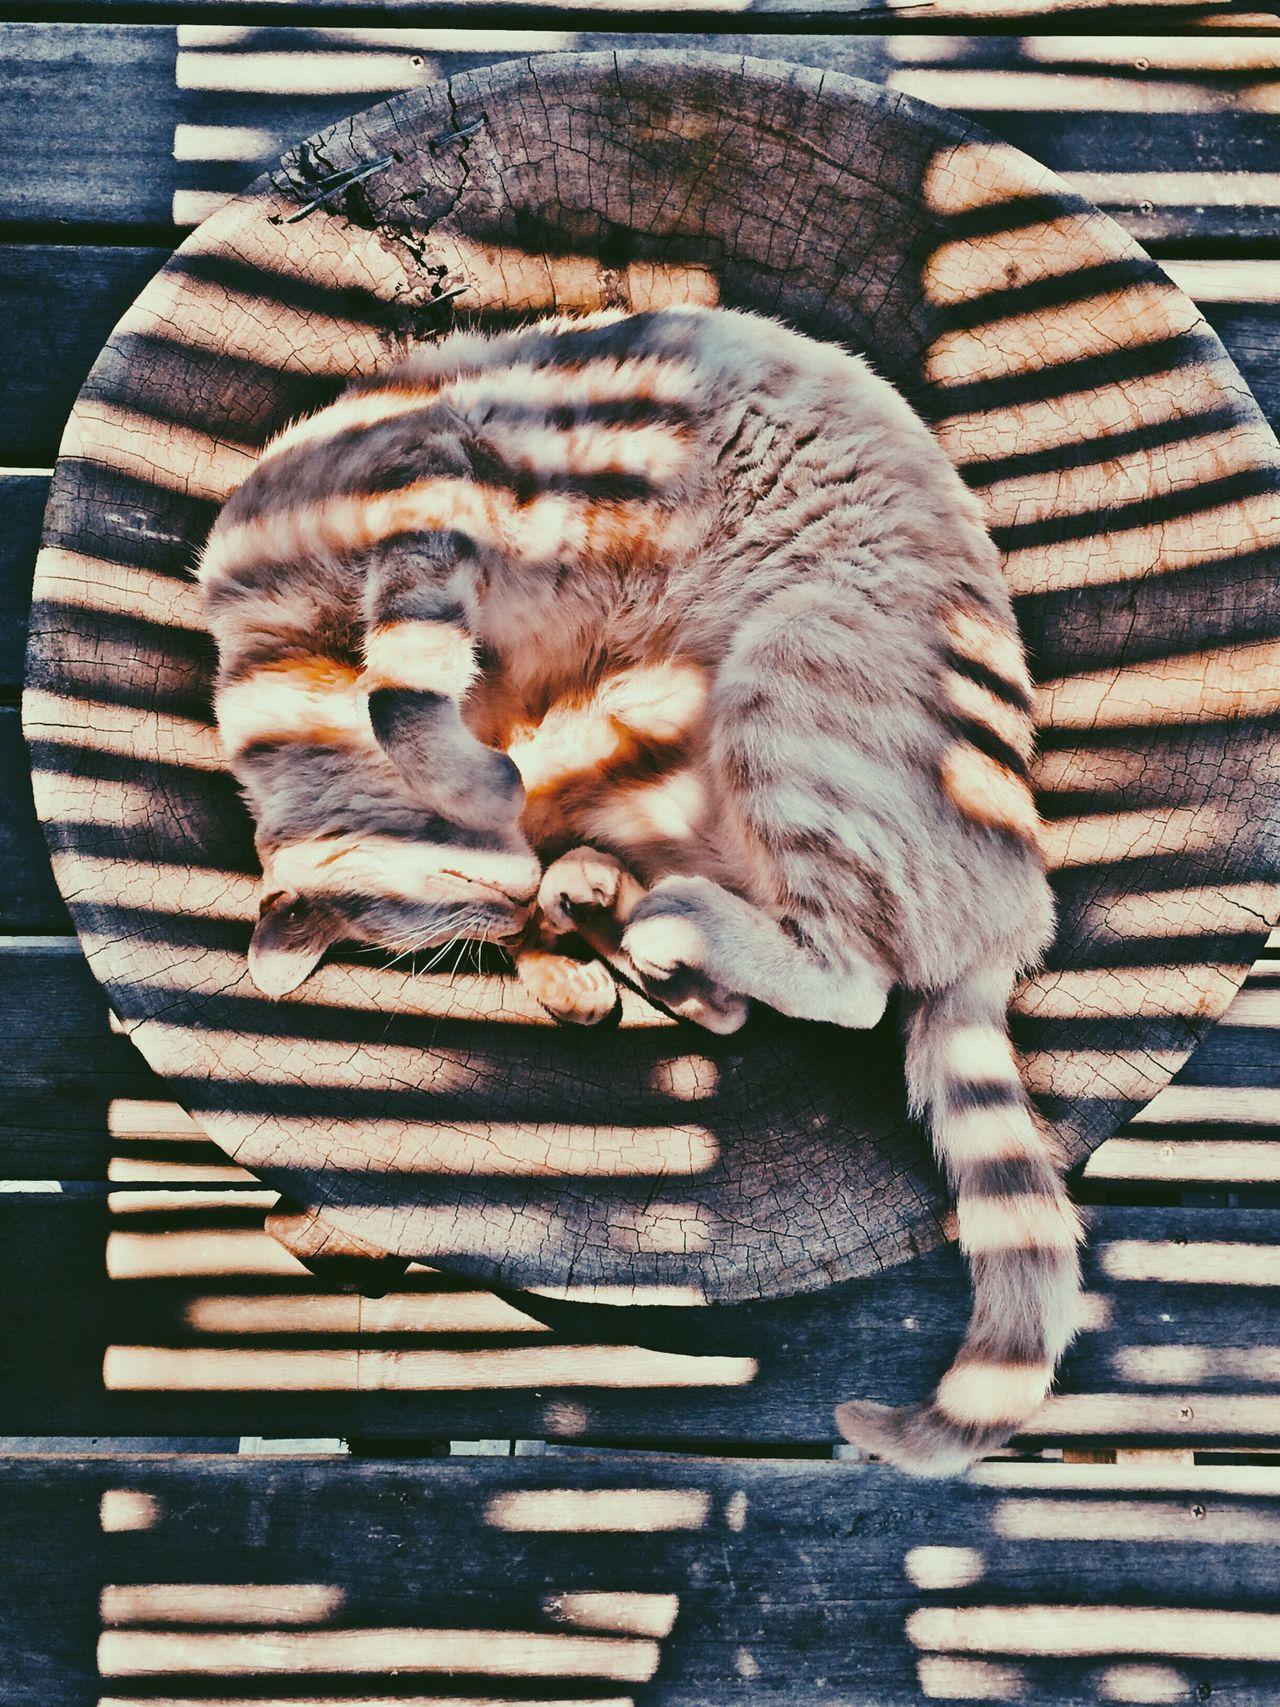 Animal Themes, Cat, Close-Up, Feline, Full Length